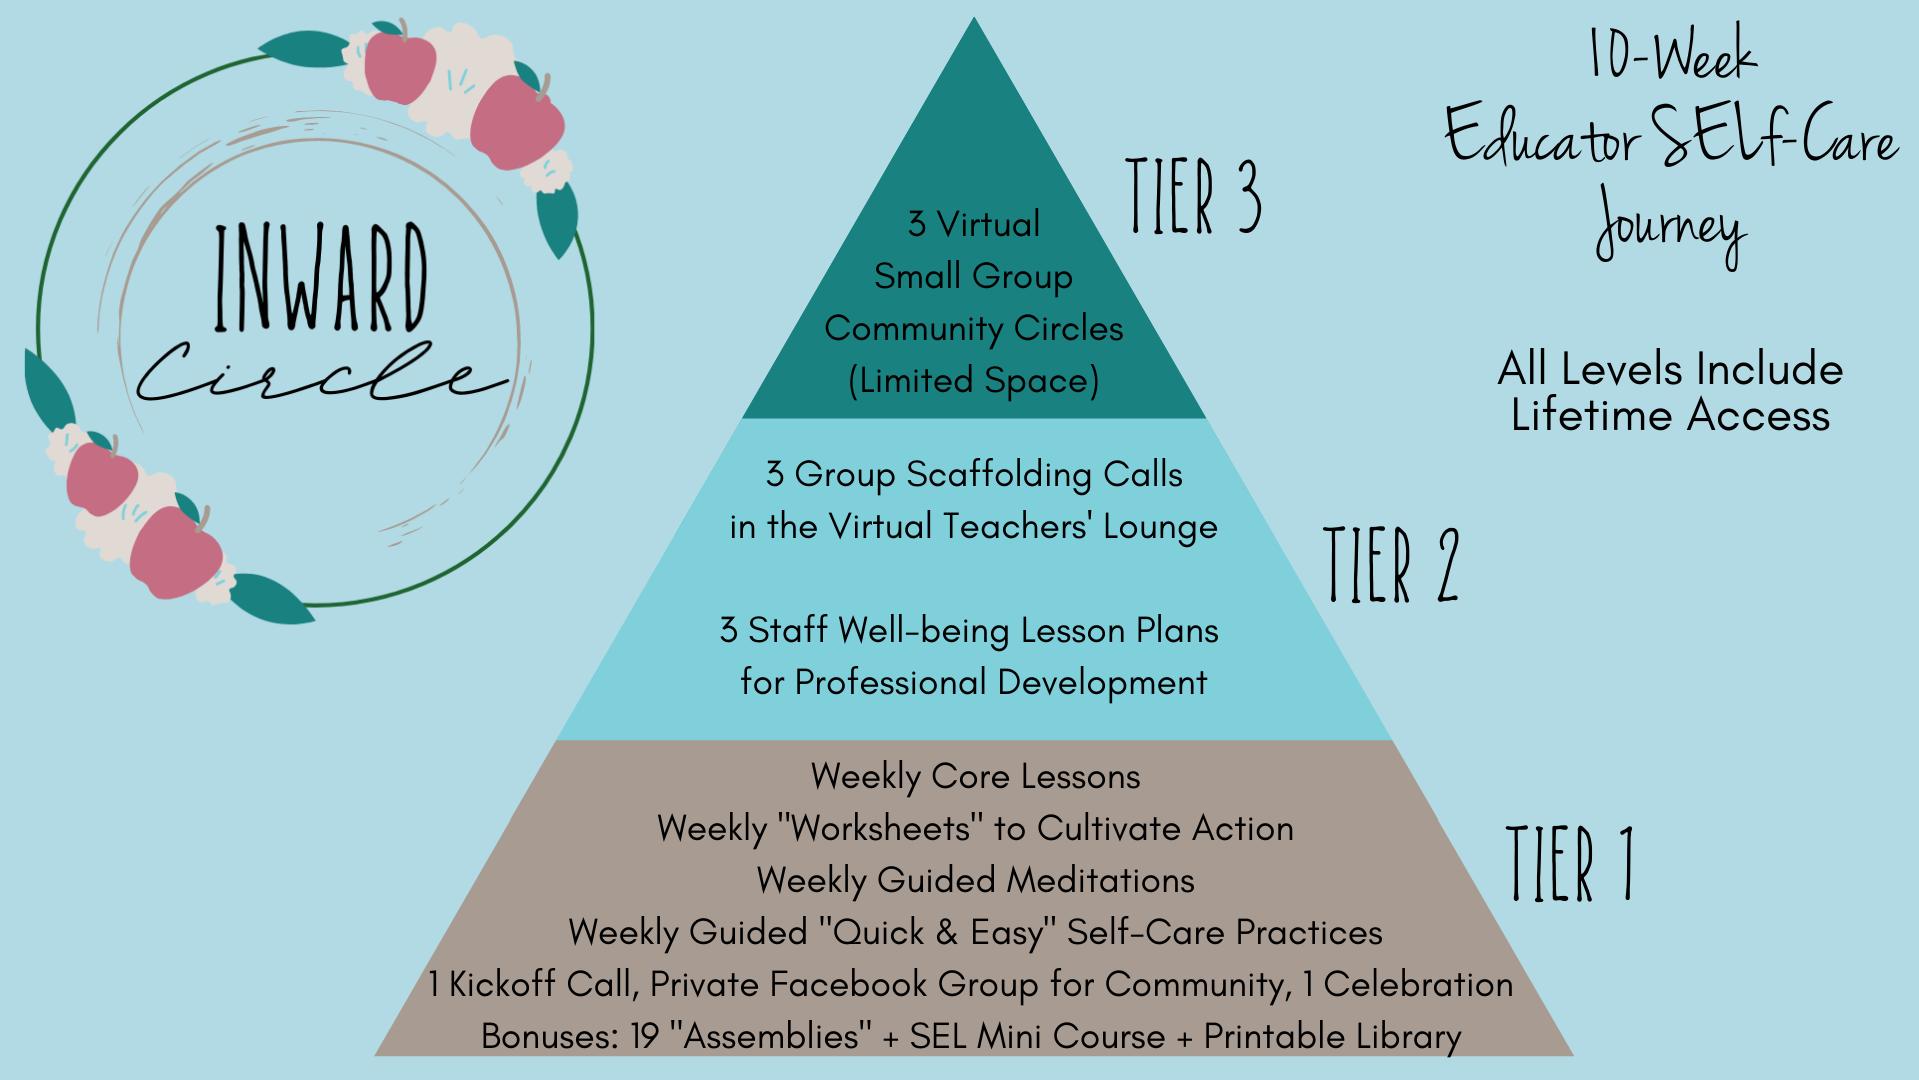 Inward Circle An Educator Self Care Journey ~ program options